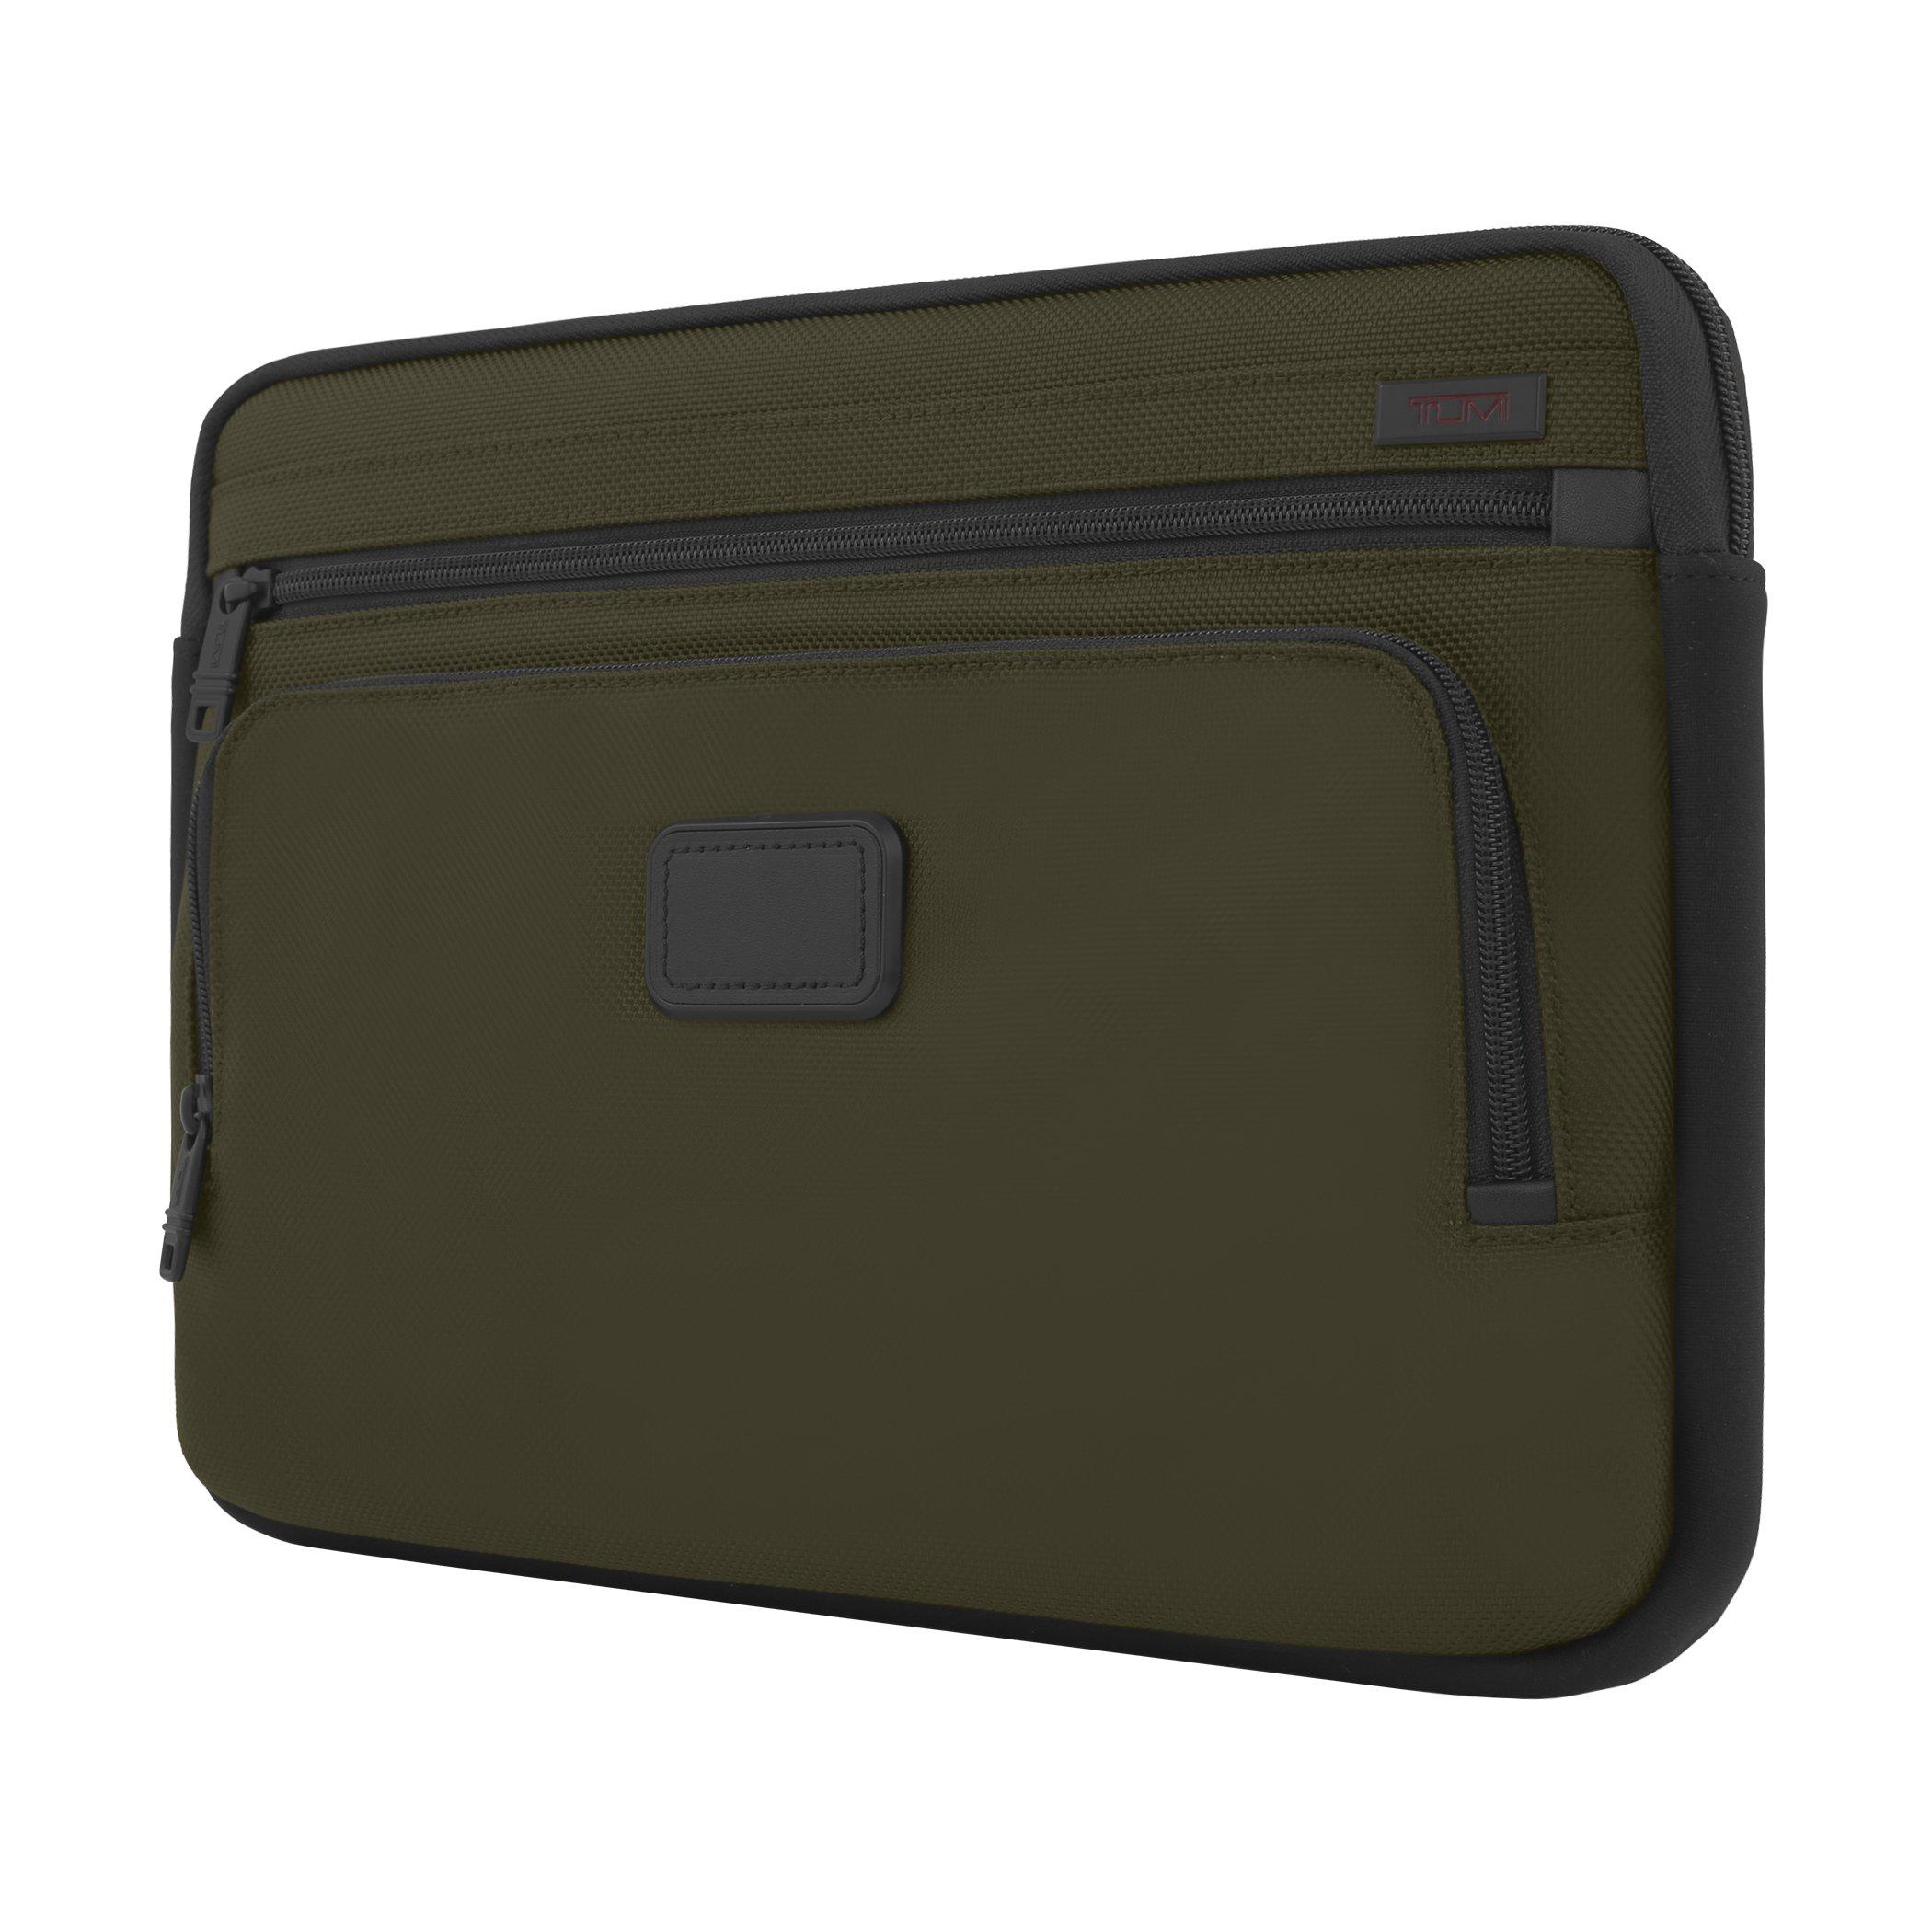 TUMI Laptop Cover for 13'' Laptops - Ballistic Nylon Olive by Incipio (Image #4)